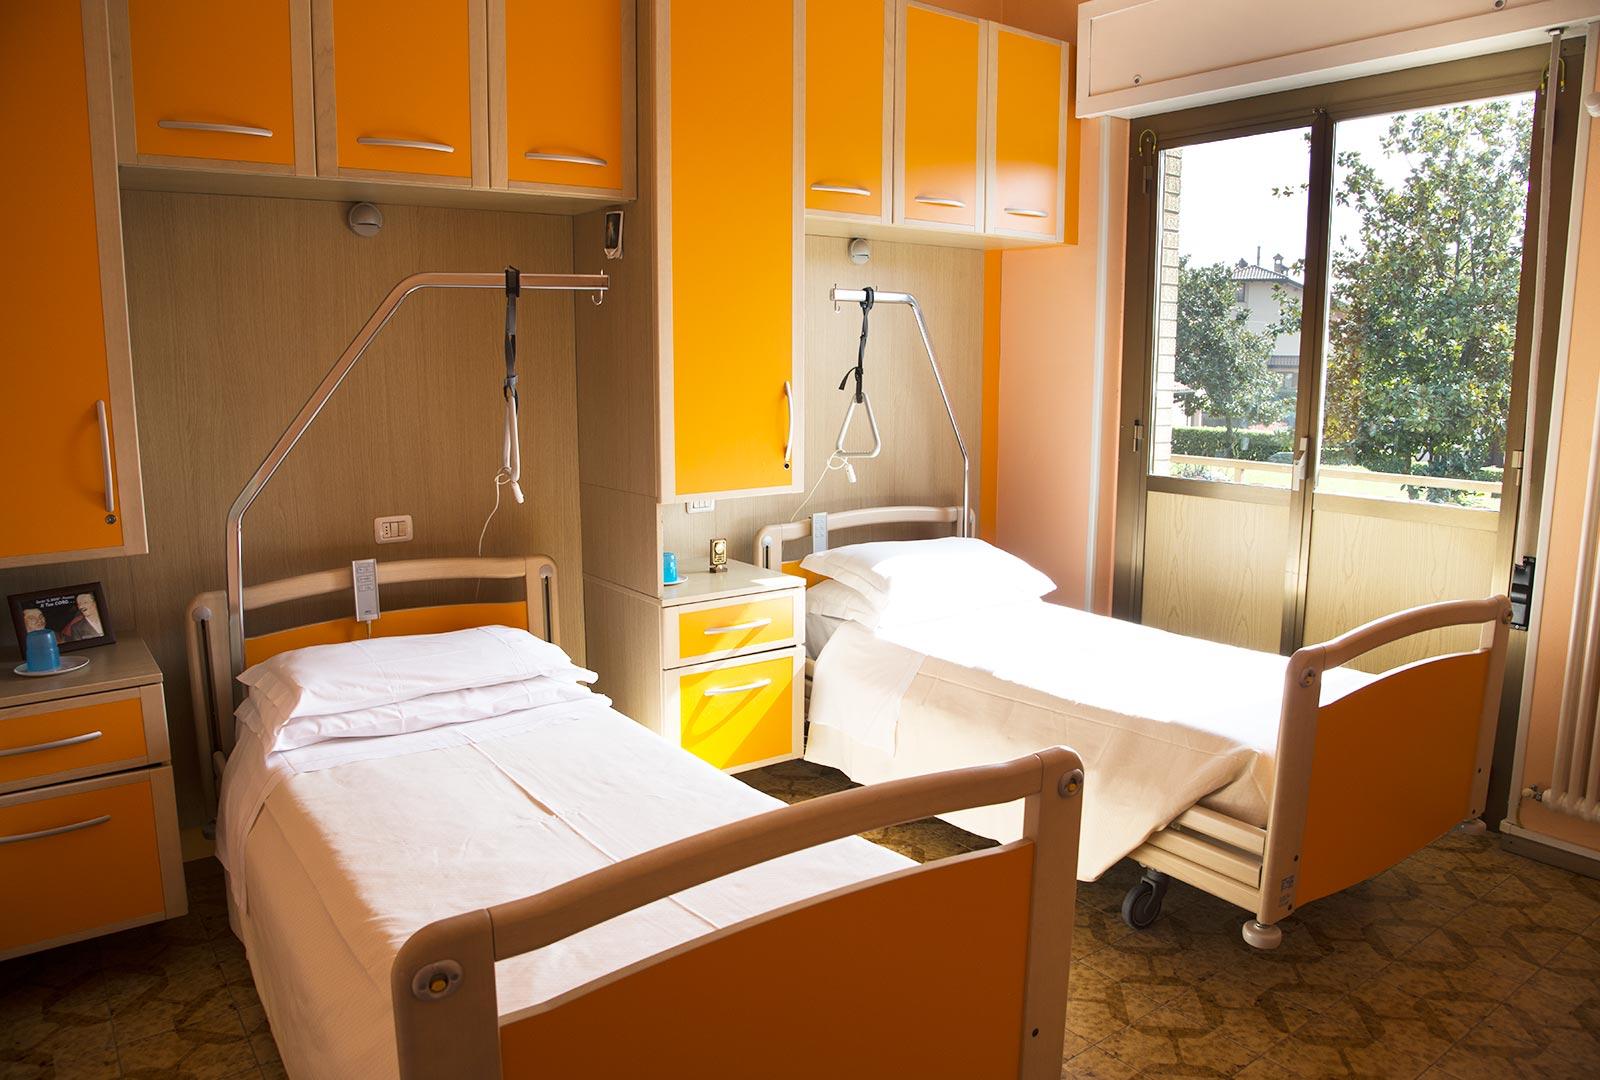 residenza sanitaria assistenziale istituto san. Black Bedroom Furniture Sets. Home Design Ideas